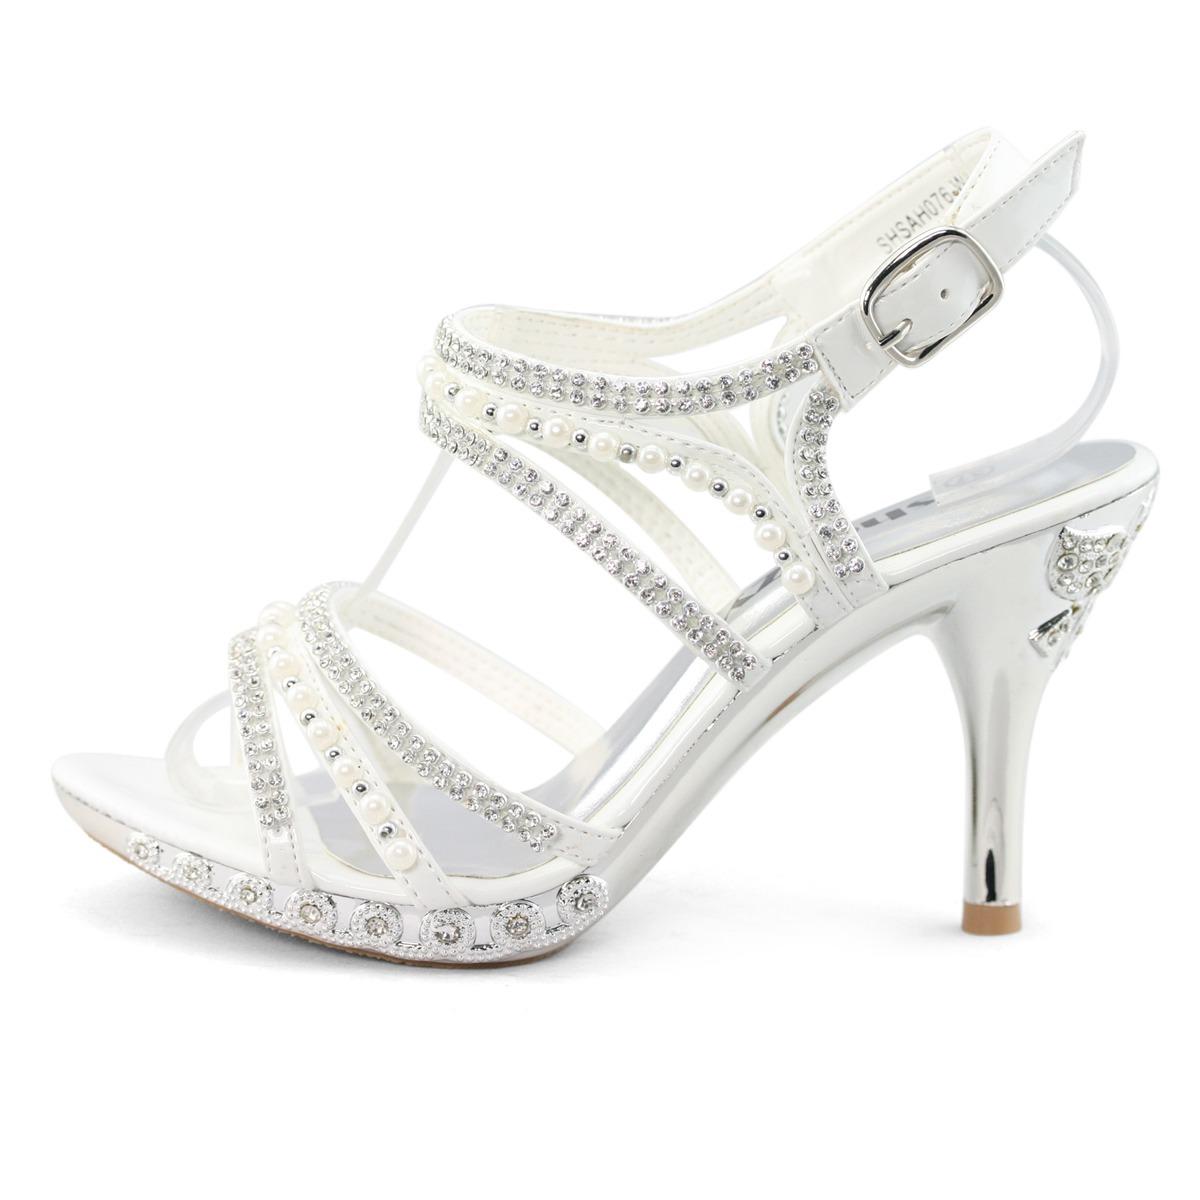 858197234d8 Wholesale SHOEZY Unique Womens Silver White Satin Pearl Rhinestone ...